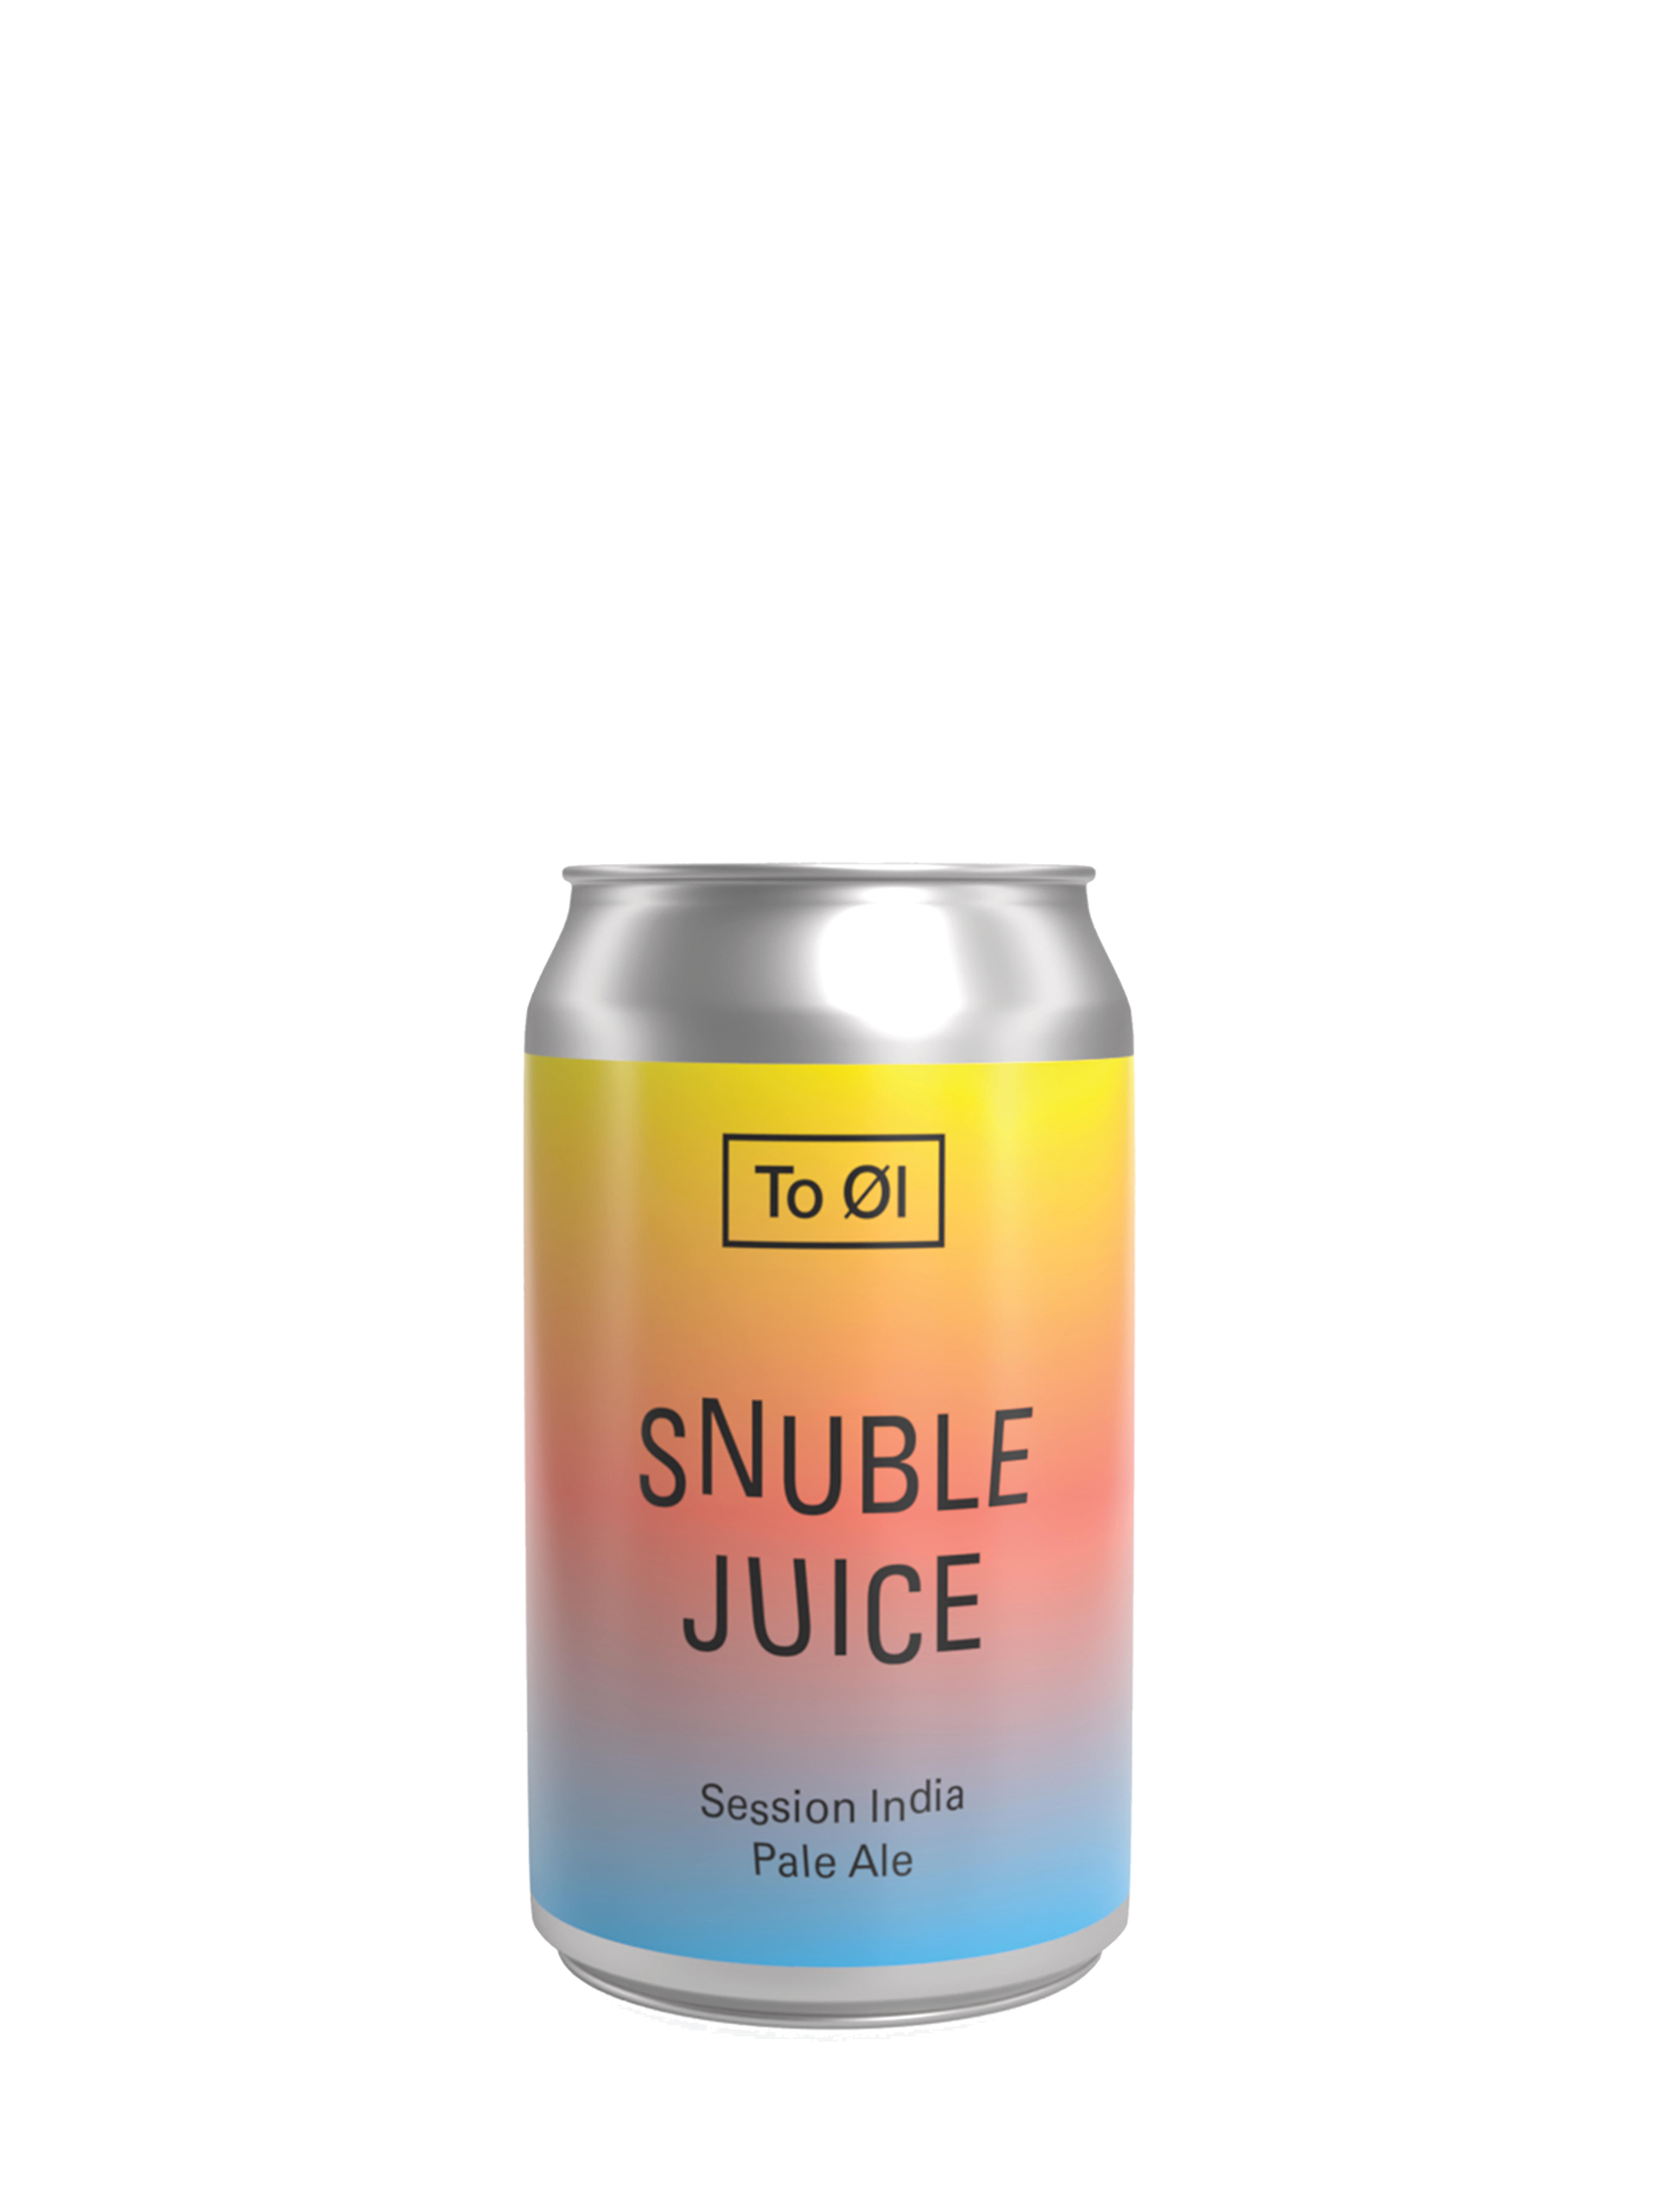 To Øl | Snublejuice | Gluten Free IPA 4.5% 330ml